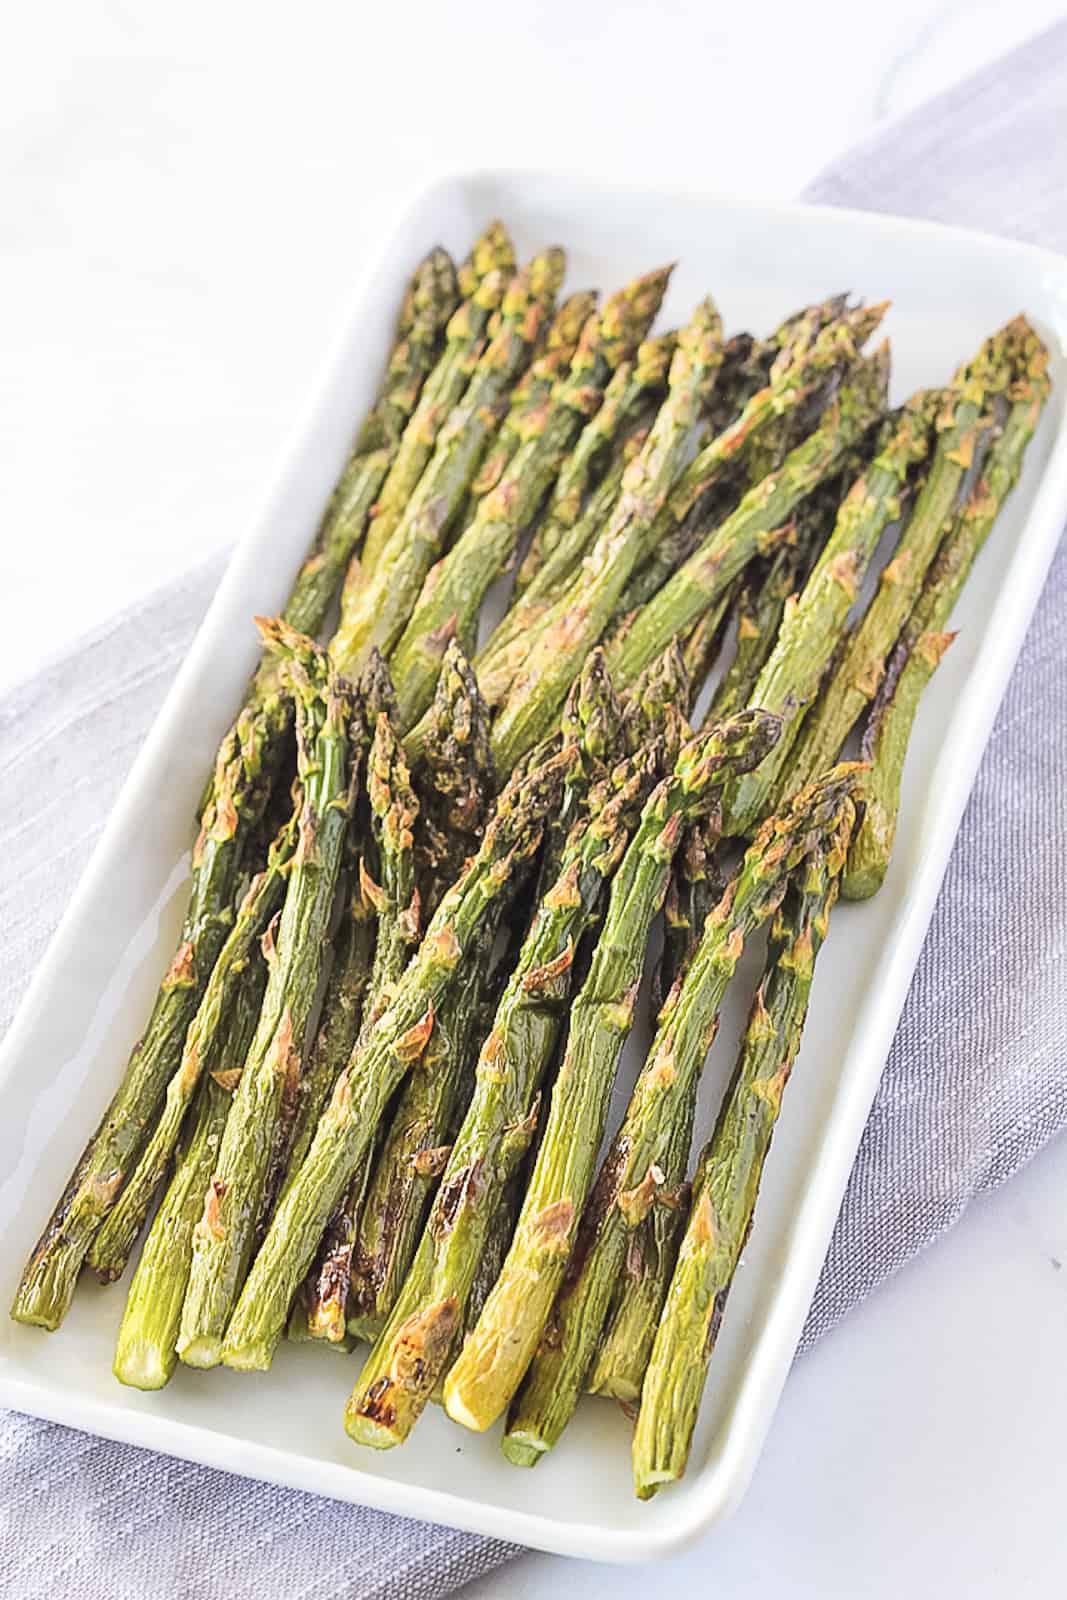 Paleo asparagus stalks on a white serving dish.